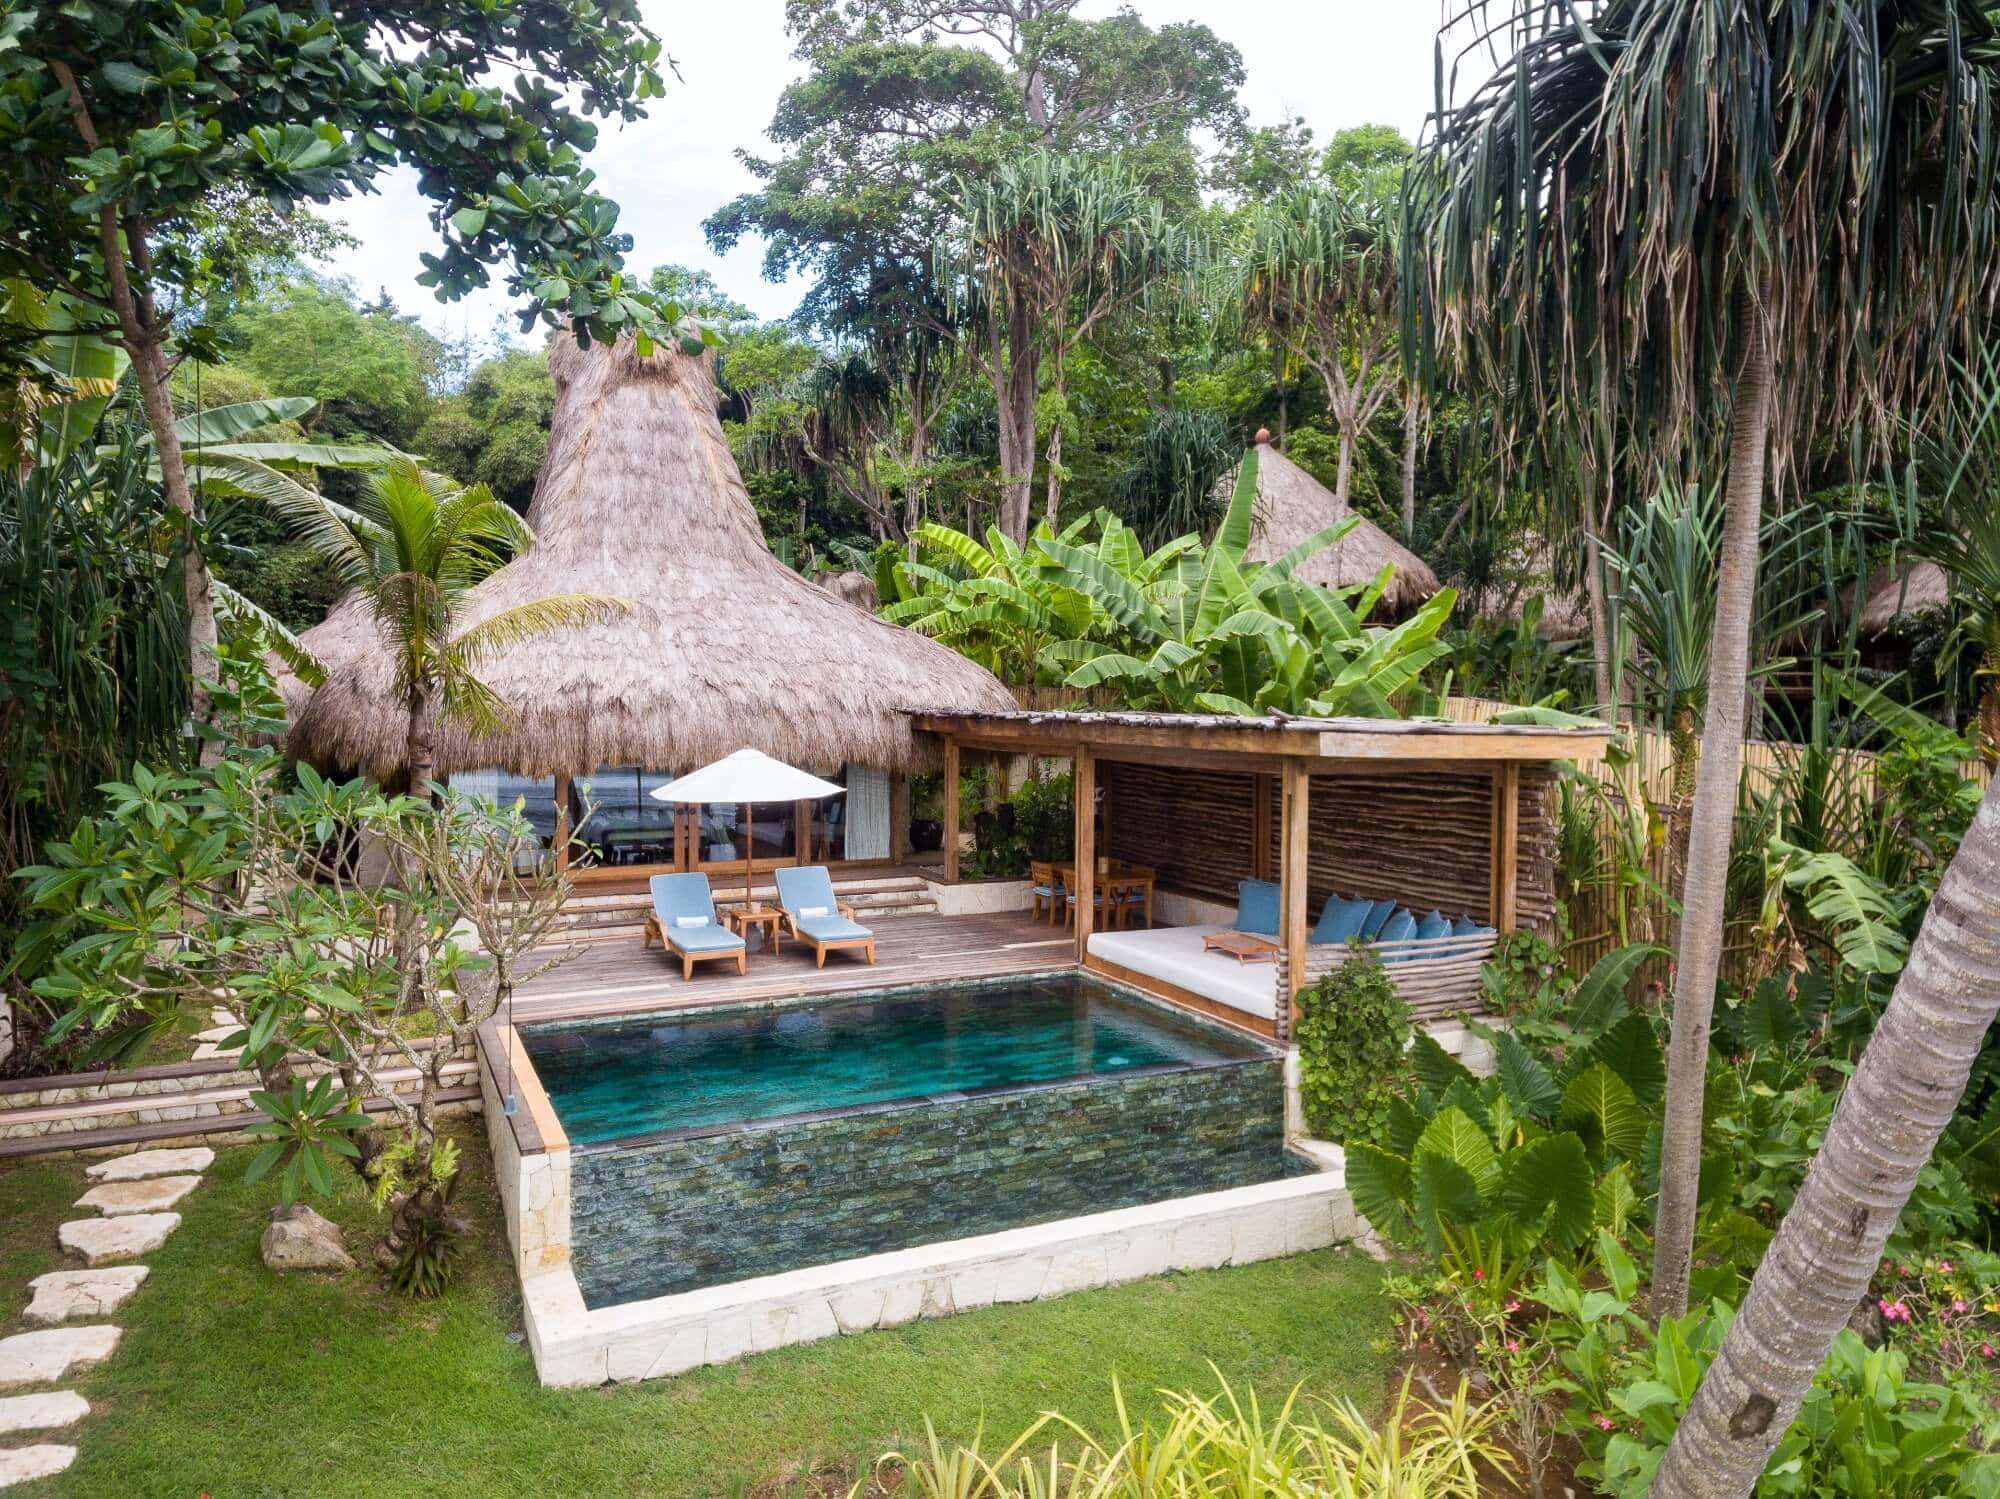 Marangga Villa at Nihi Sumba, Indonesia